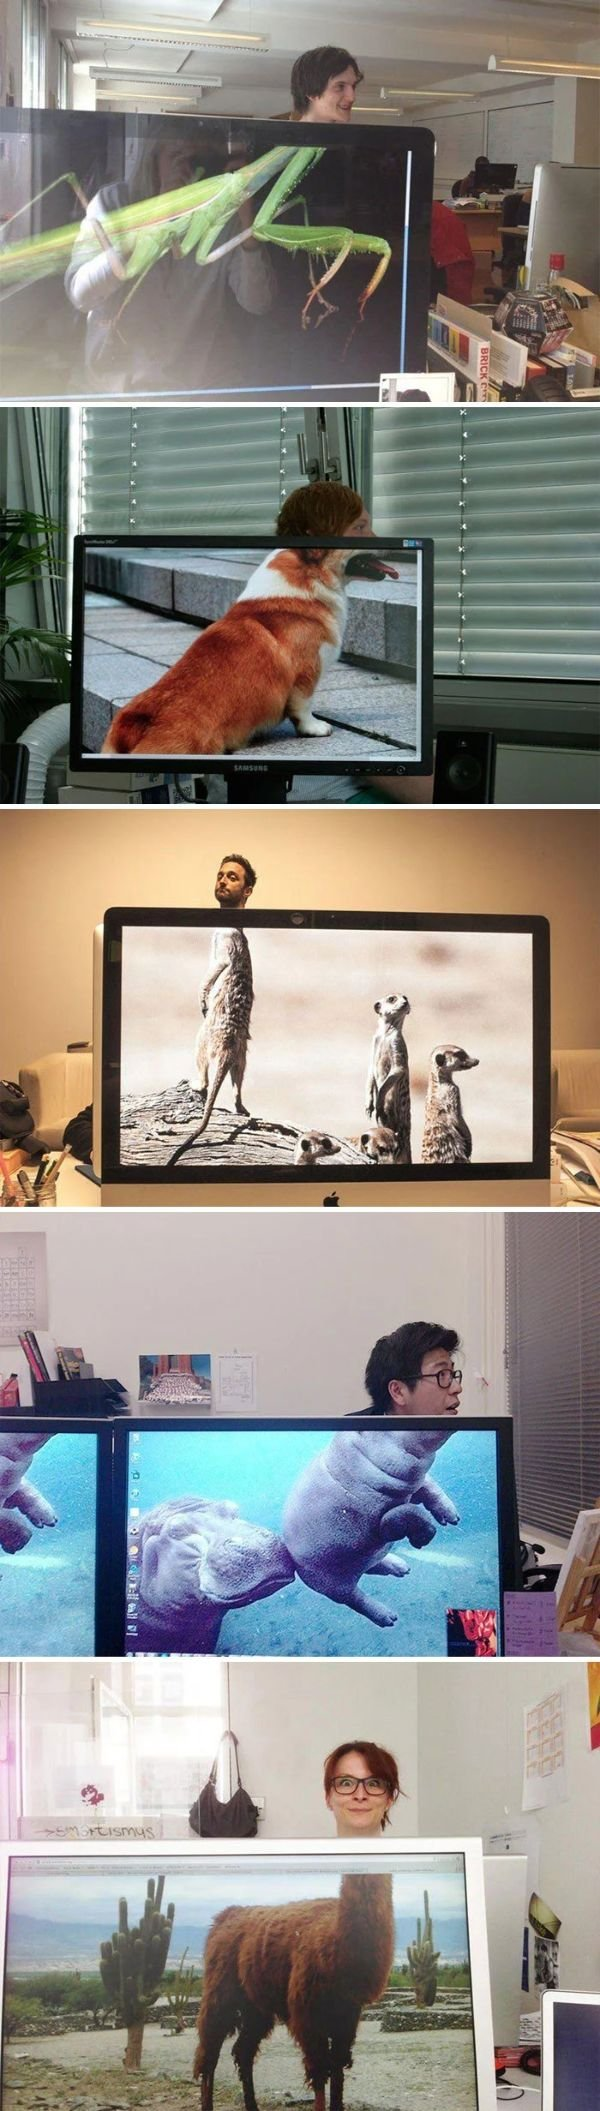 Creative Wallpapers (26 pics)